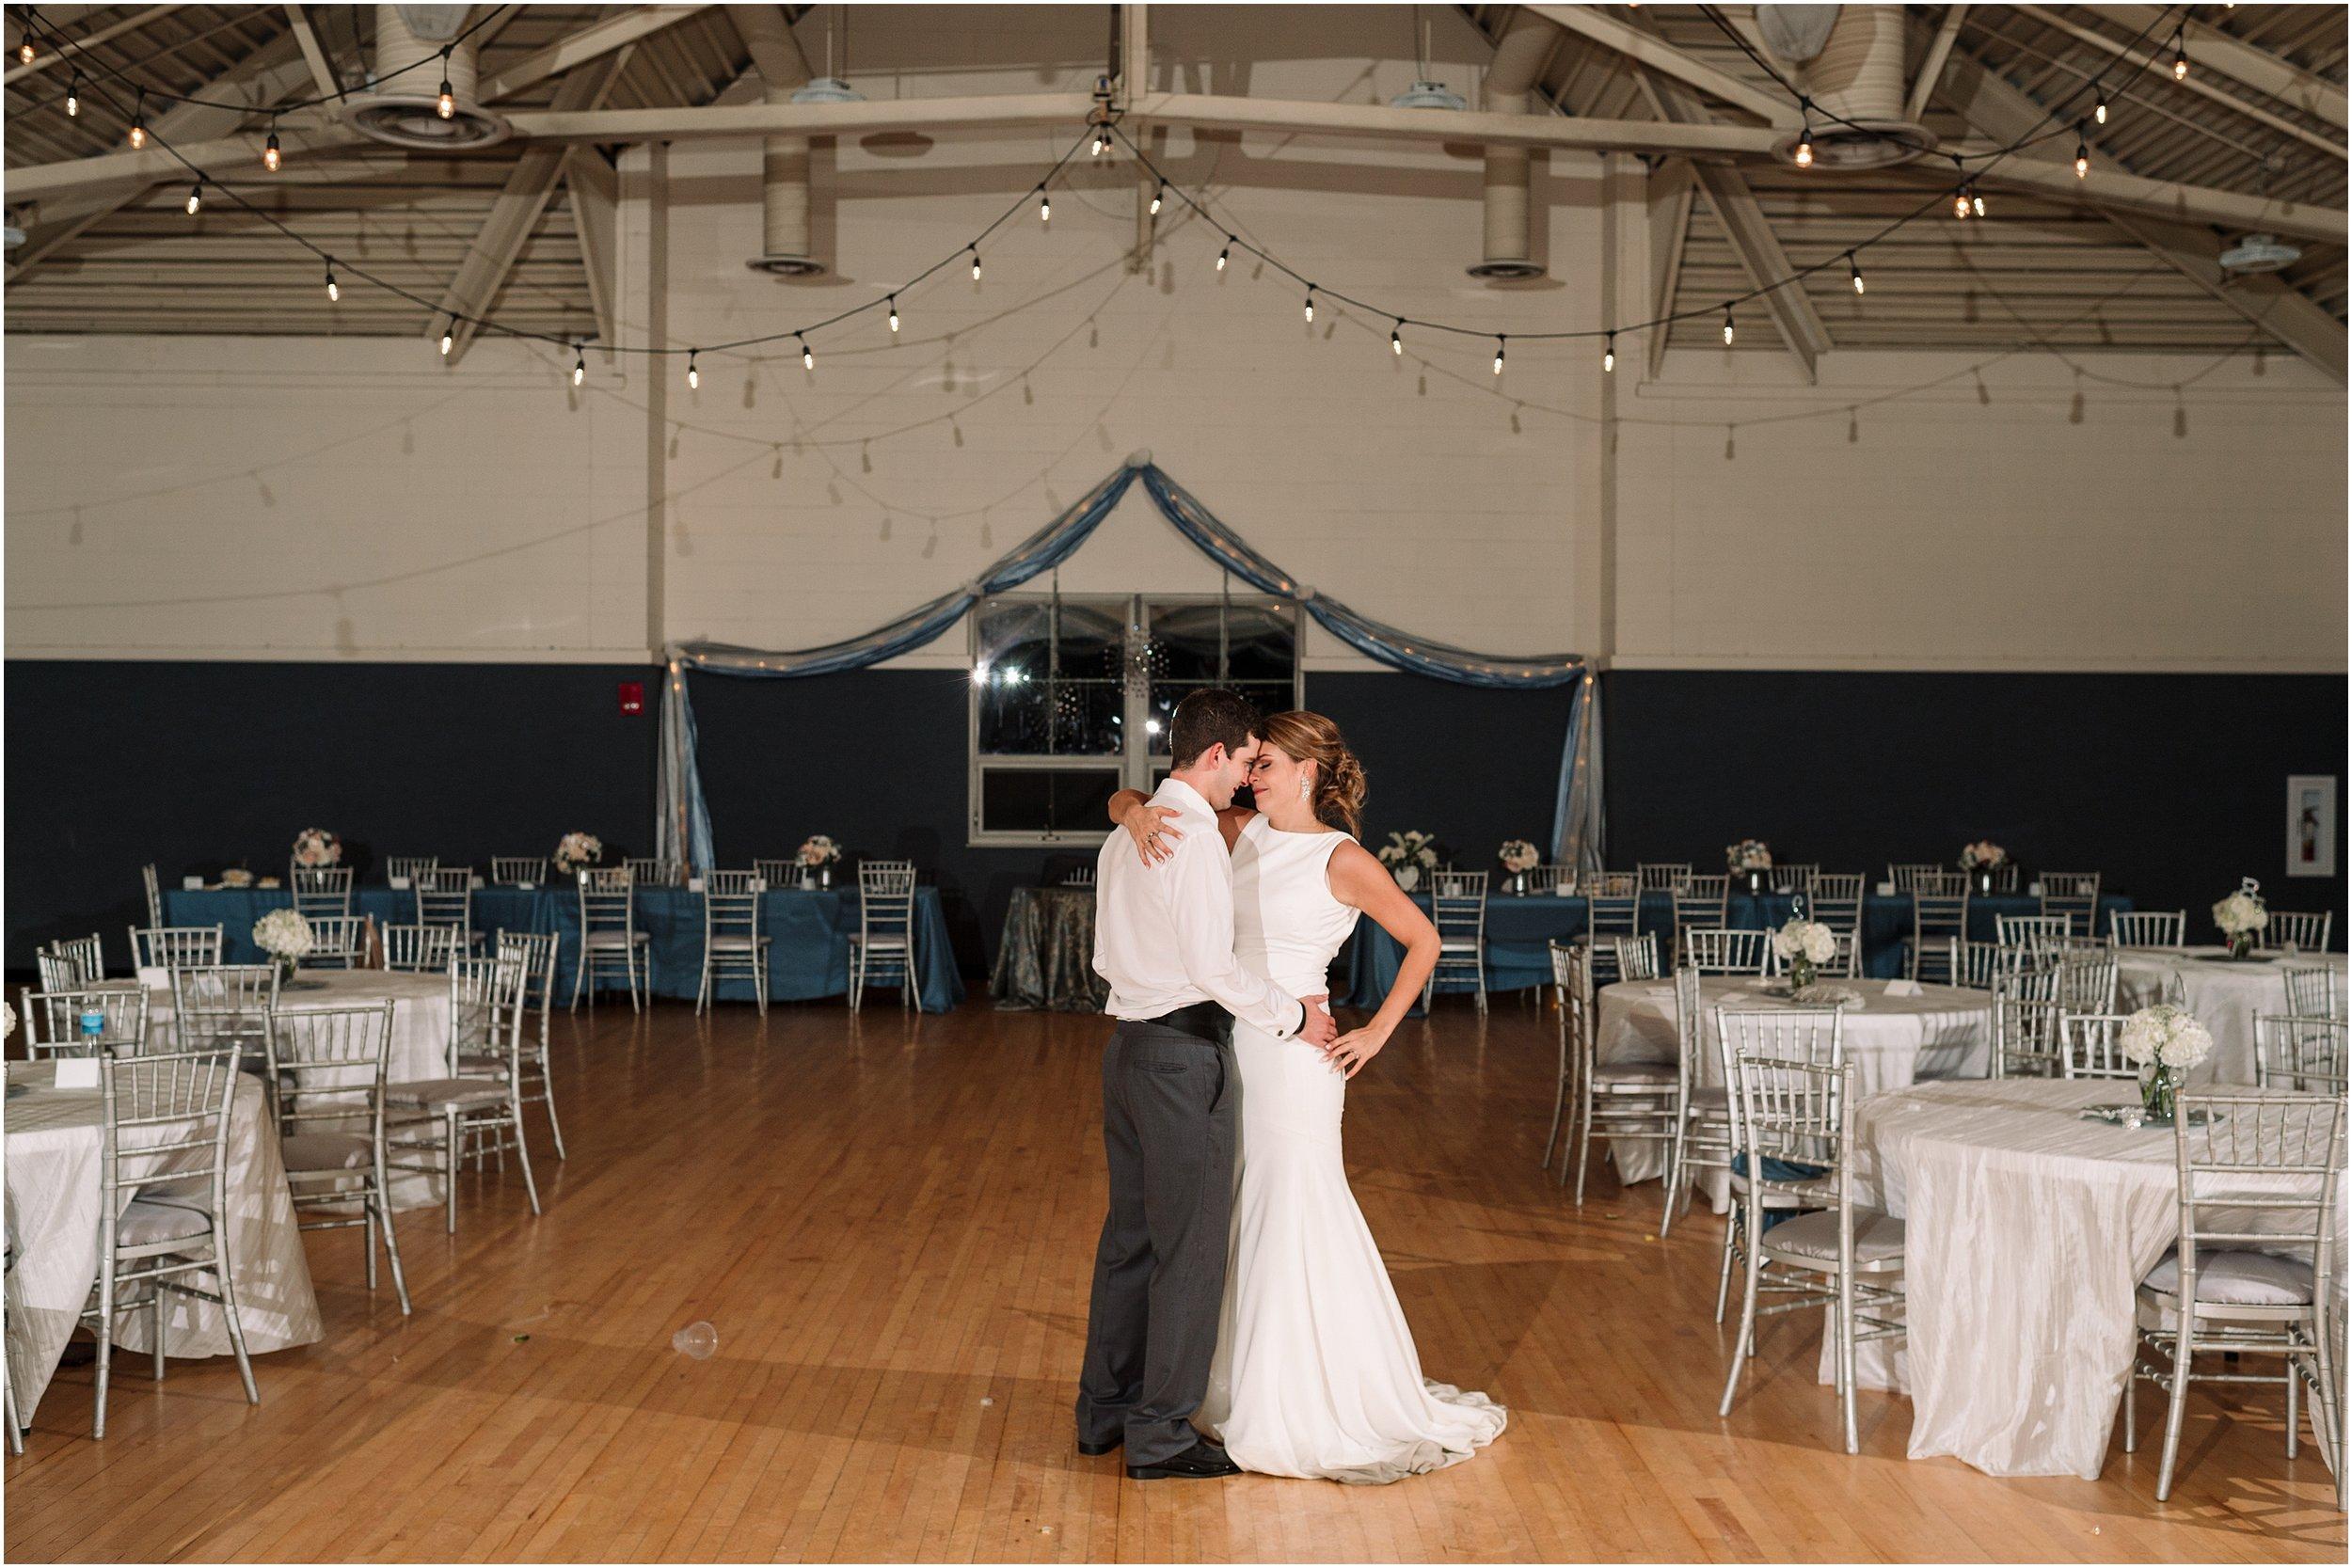 hannah leigh photography ellicott city church wedding baltimore md_2175.jpg